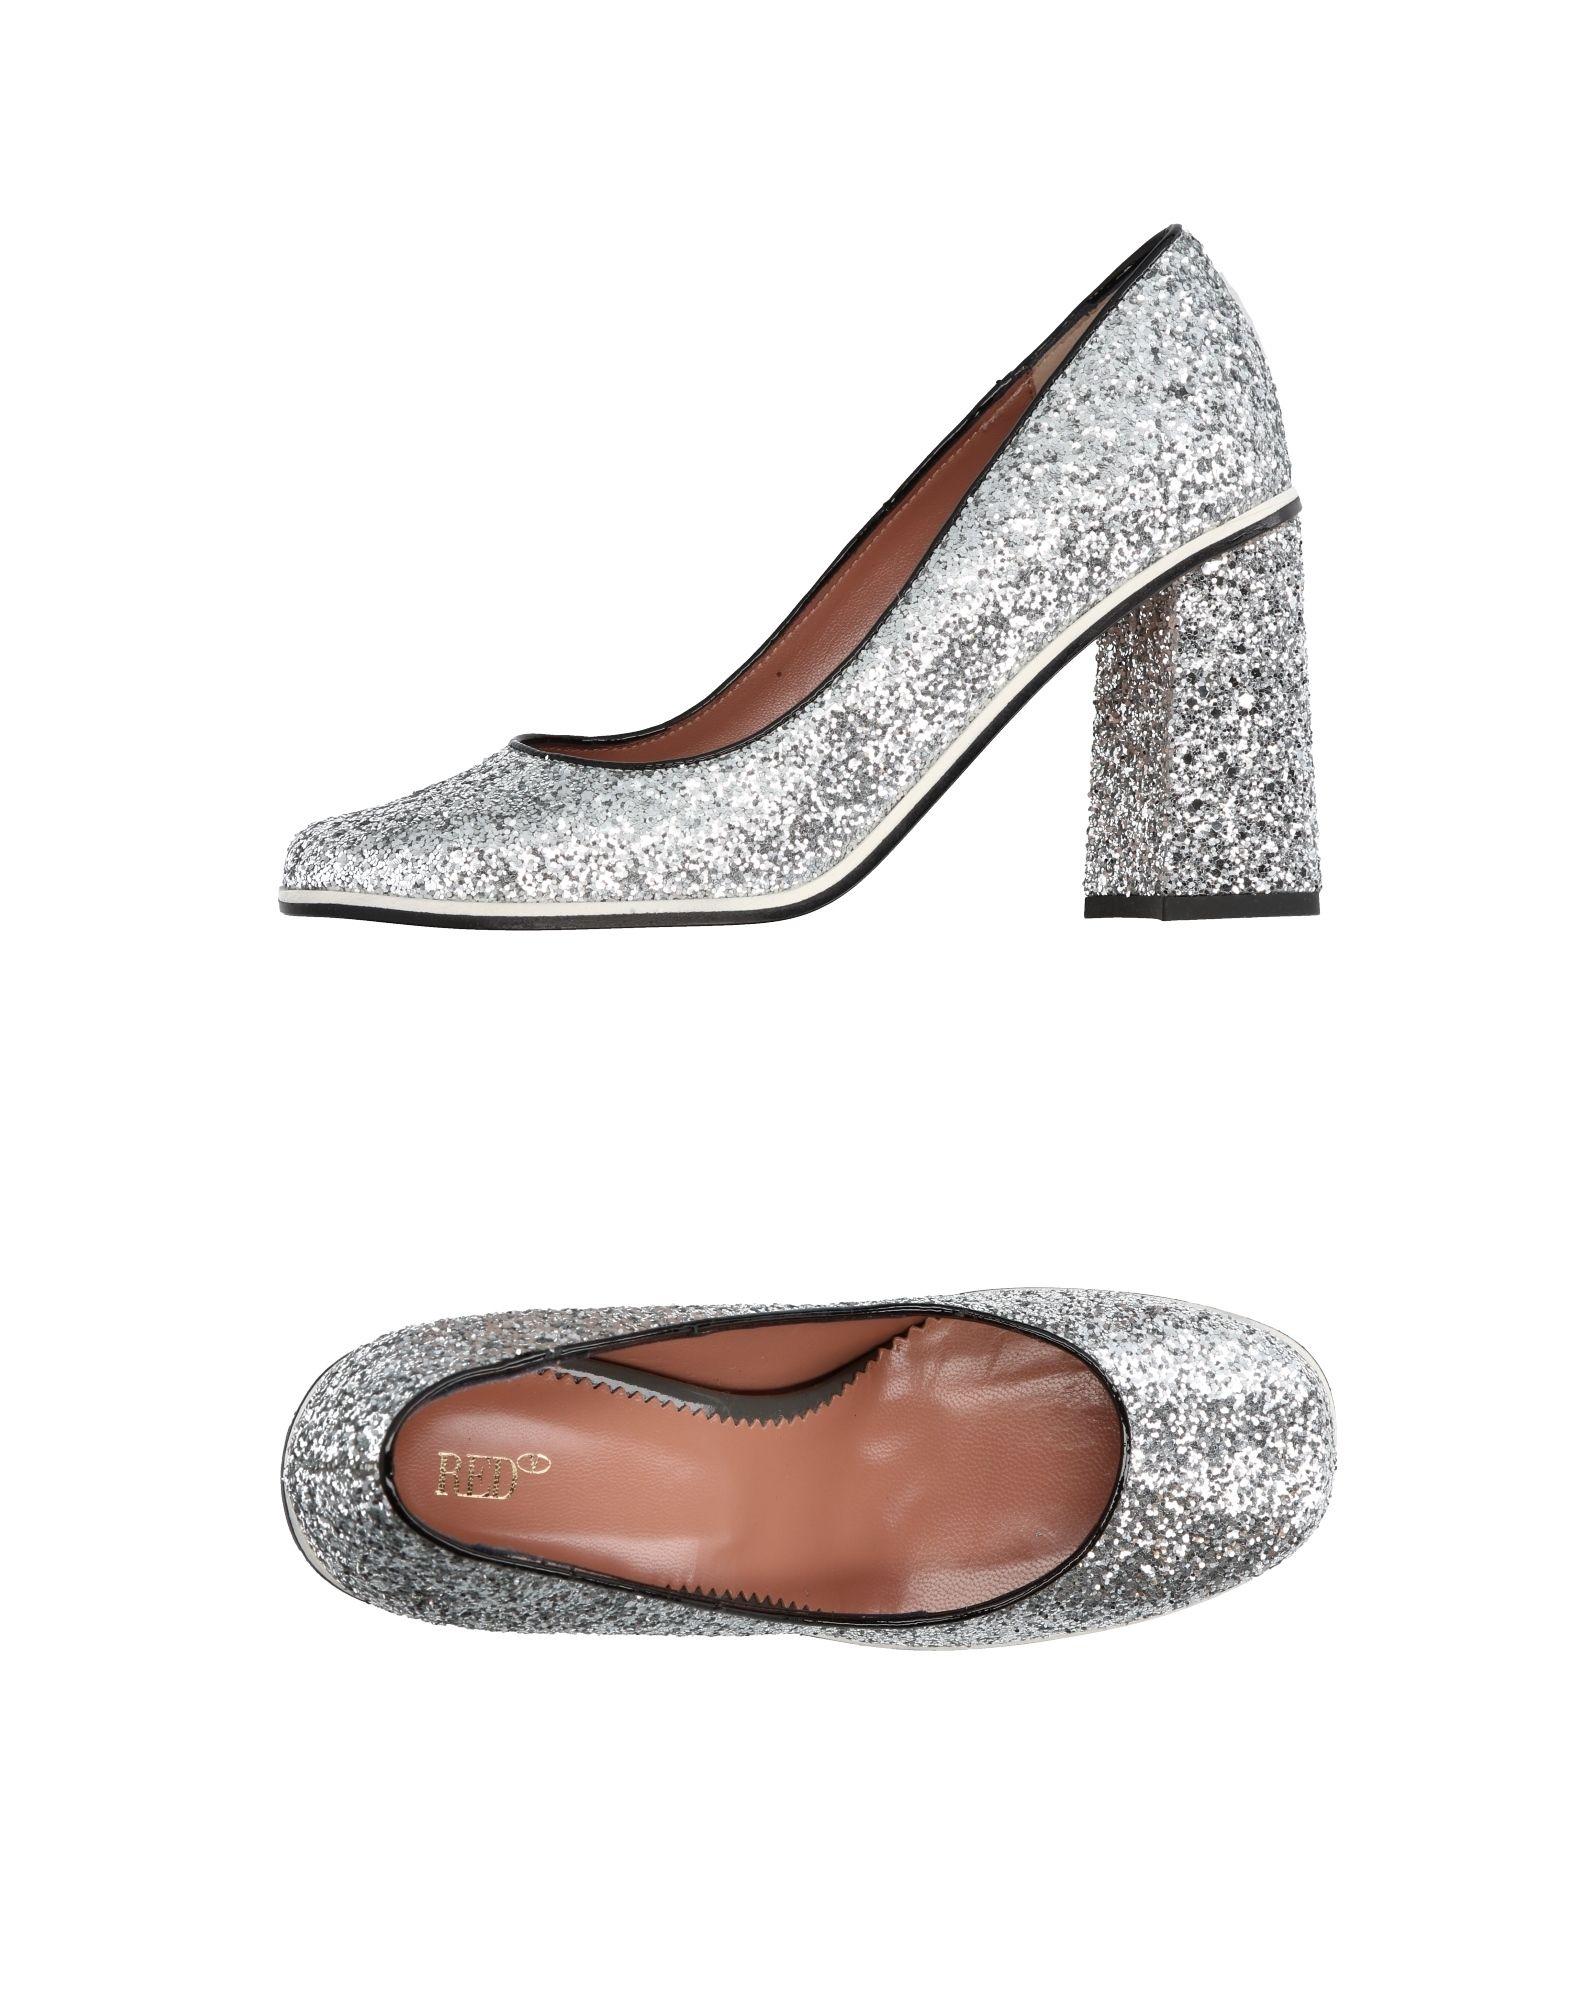 Stilvolle Damen billige Schuhe Red(V) Pumps Damen Stilvolle  11286976TH 95b006